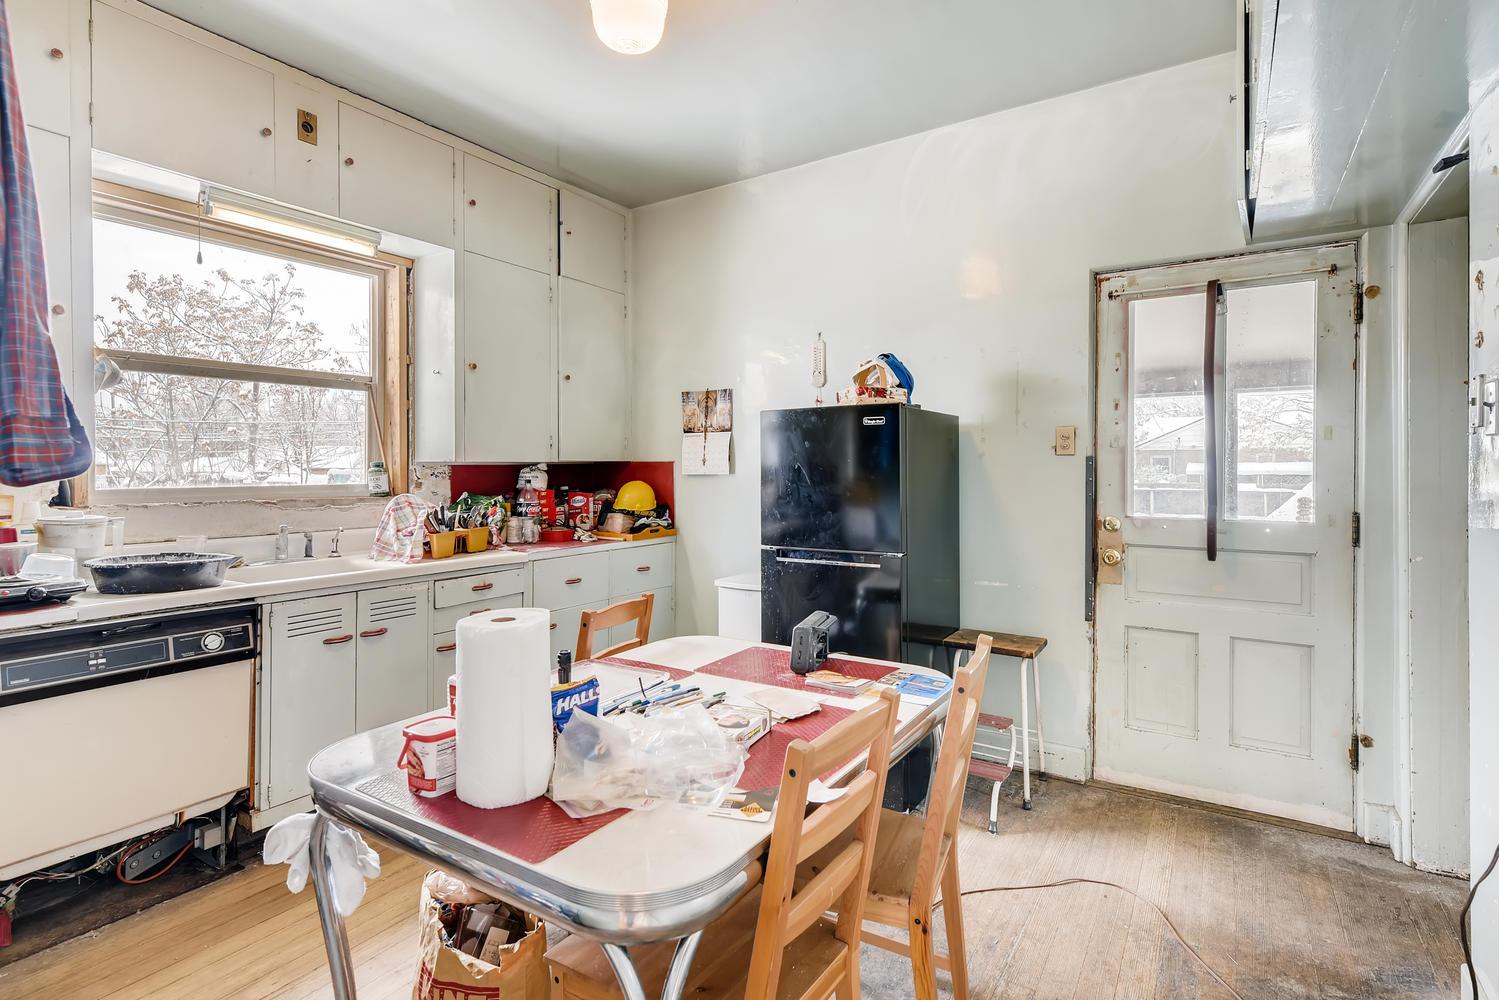 2177 S Bannock Denver CO 80223-large-014-014-Kitchen-1500x1000-72dpi